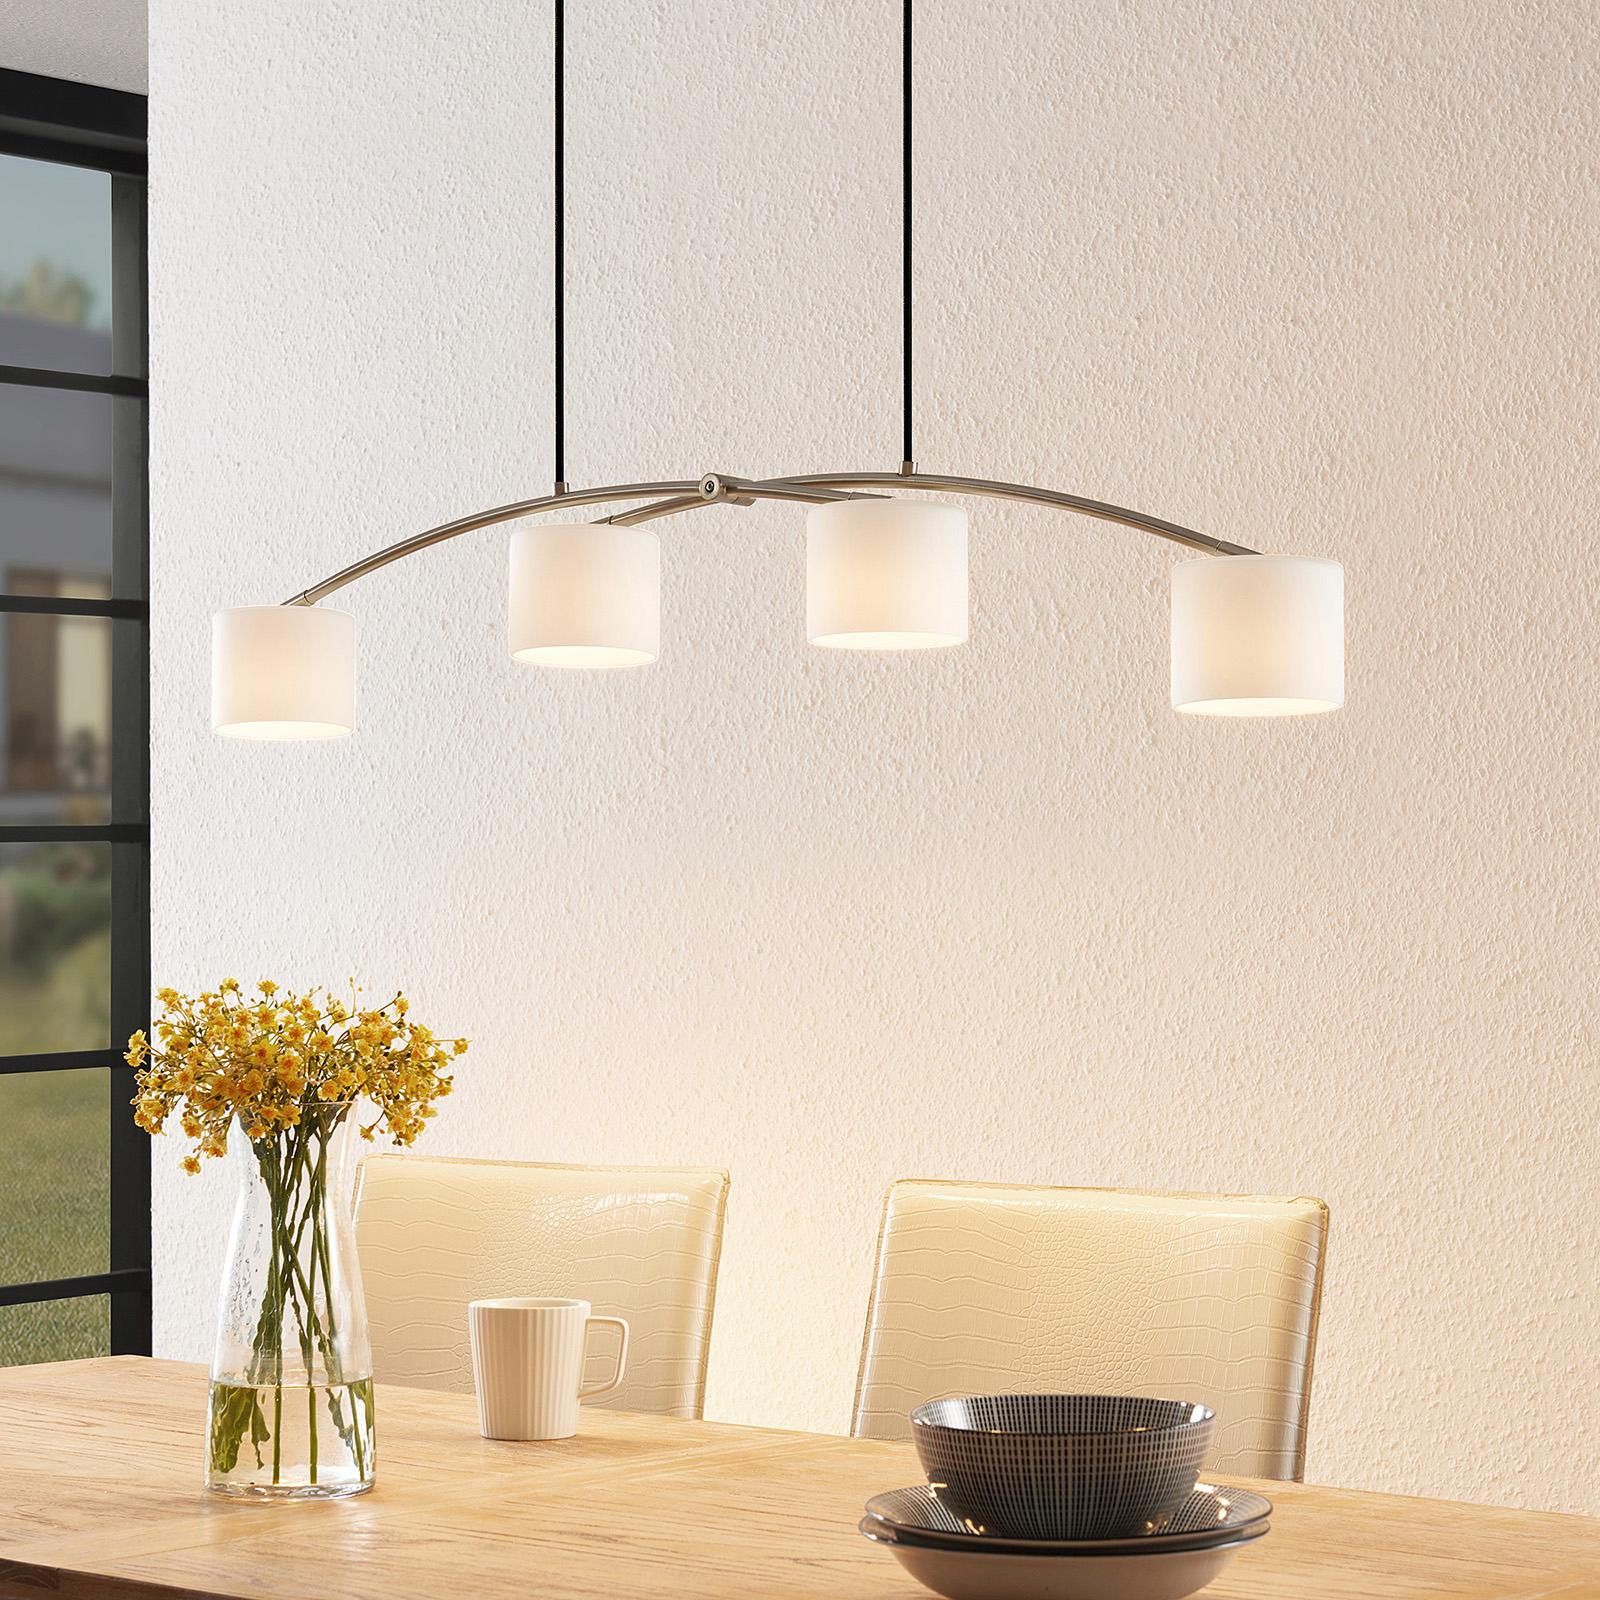 Lucande Juljana lámpara colgante, 4 luces, textil